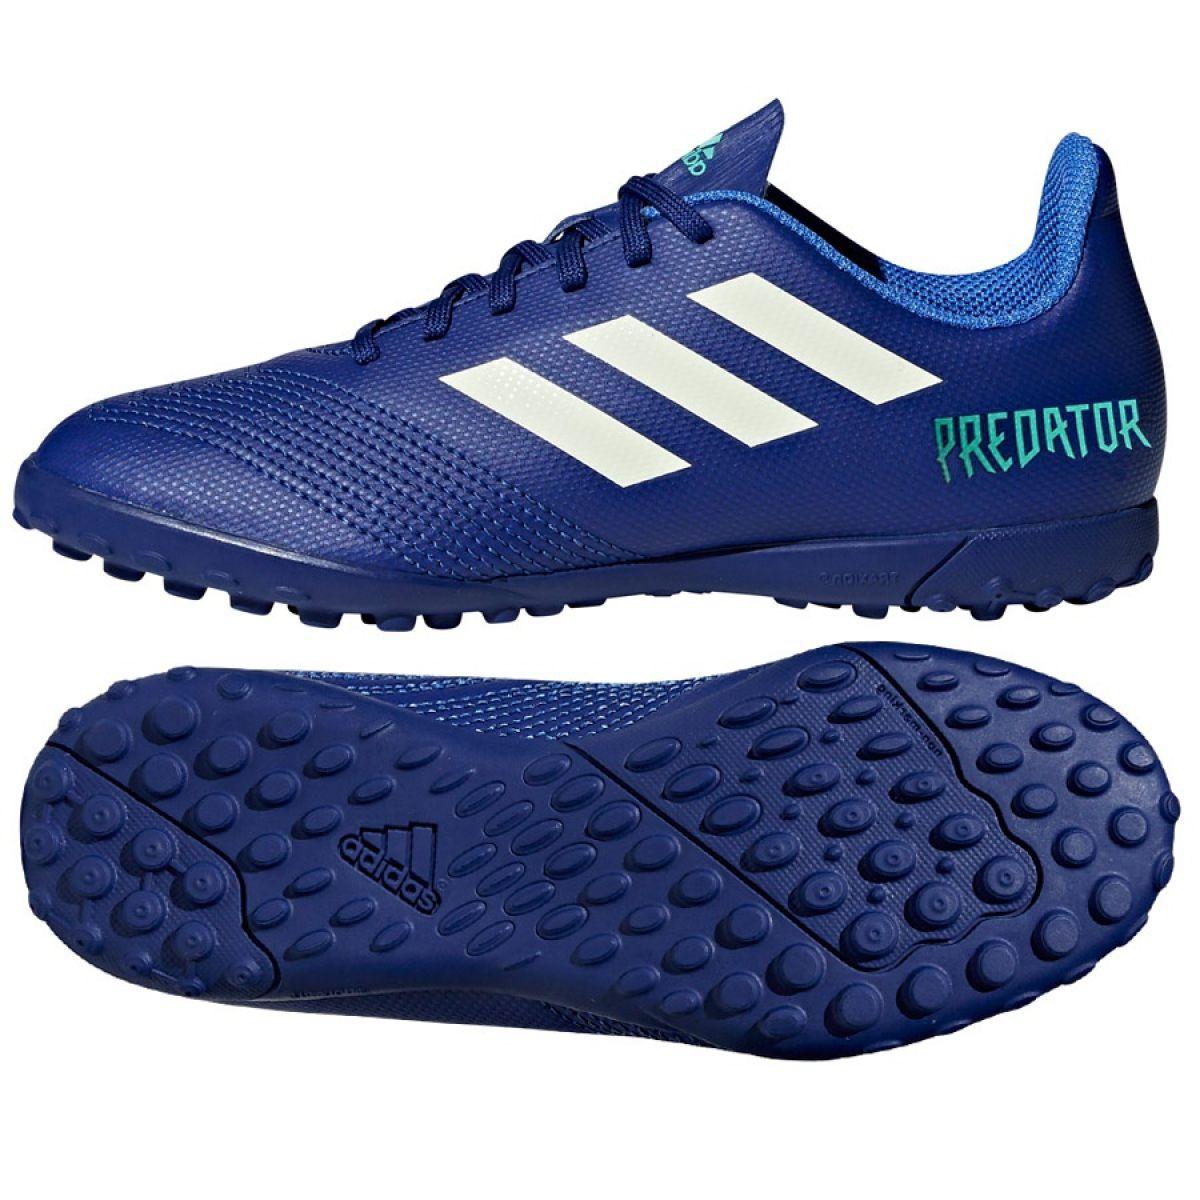 Buty piłkarskie adidas Predator Tango 18.4 TF różne kolory